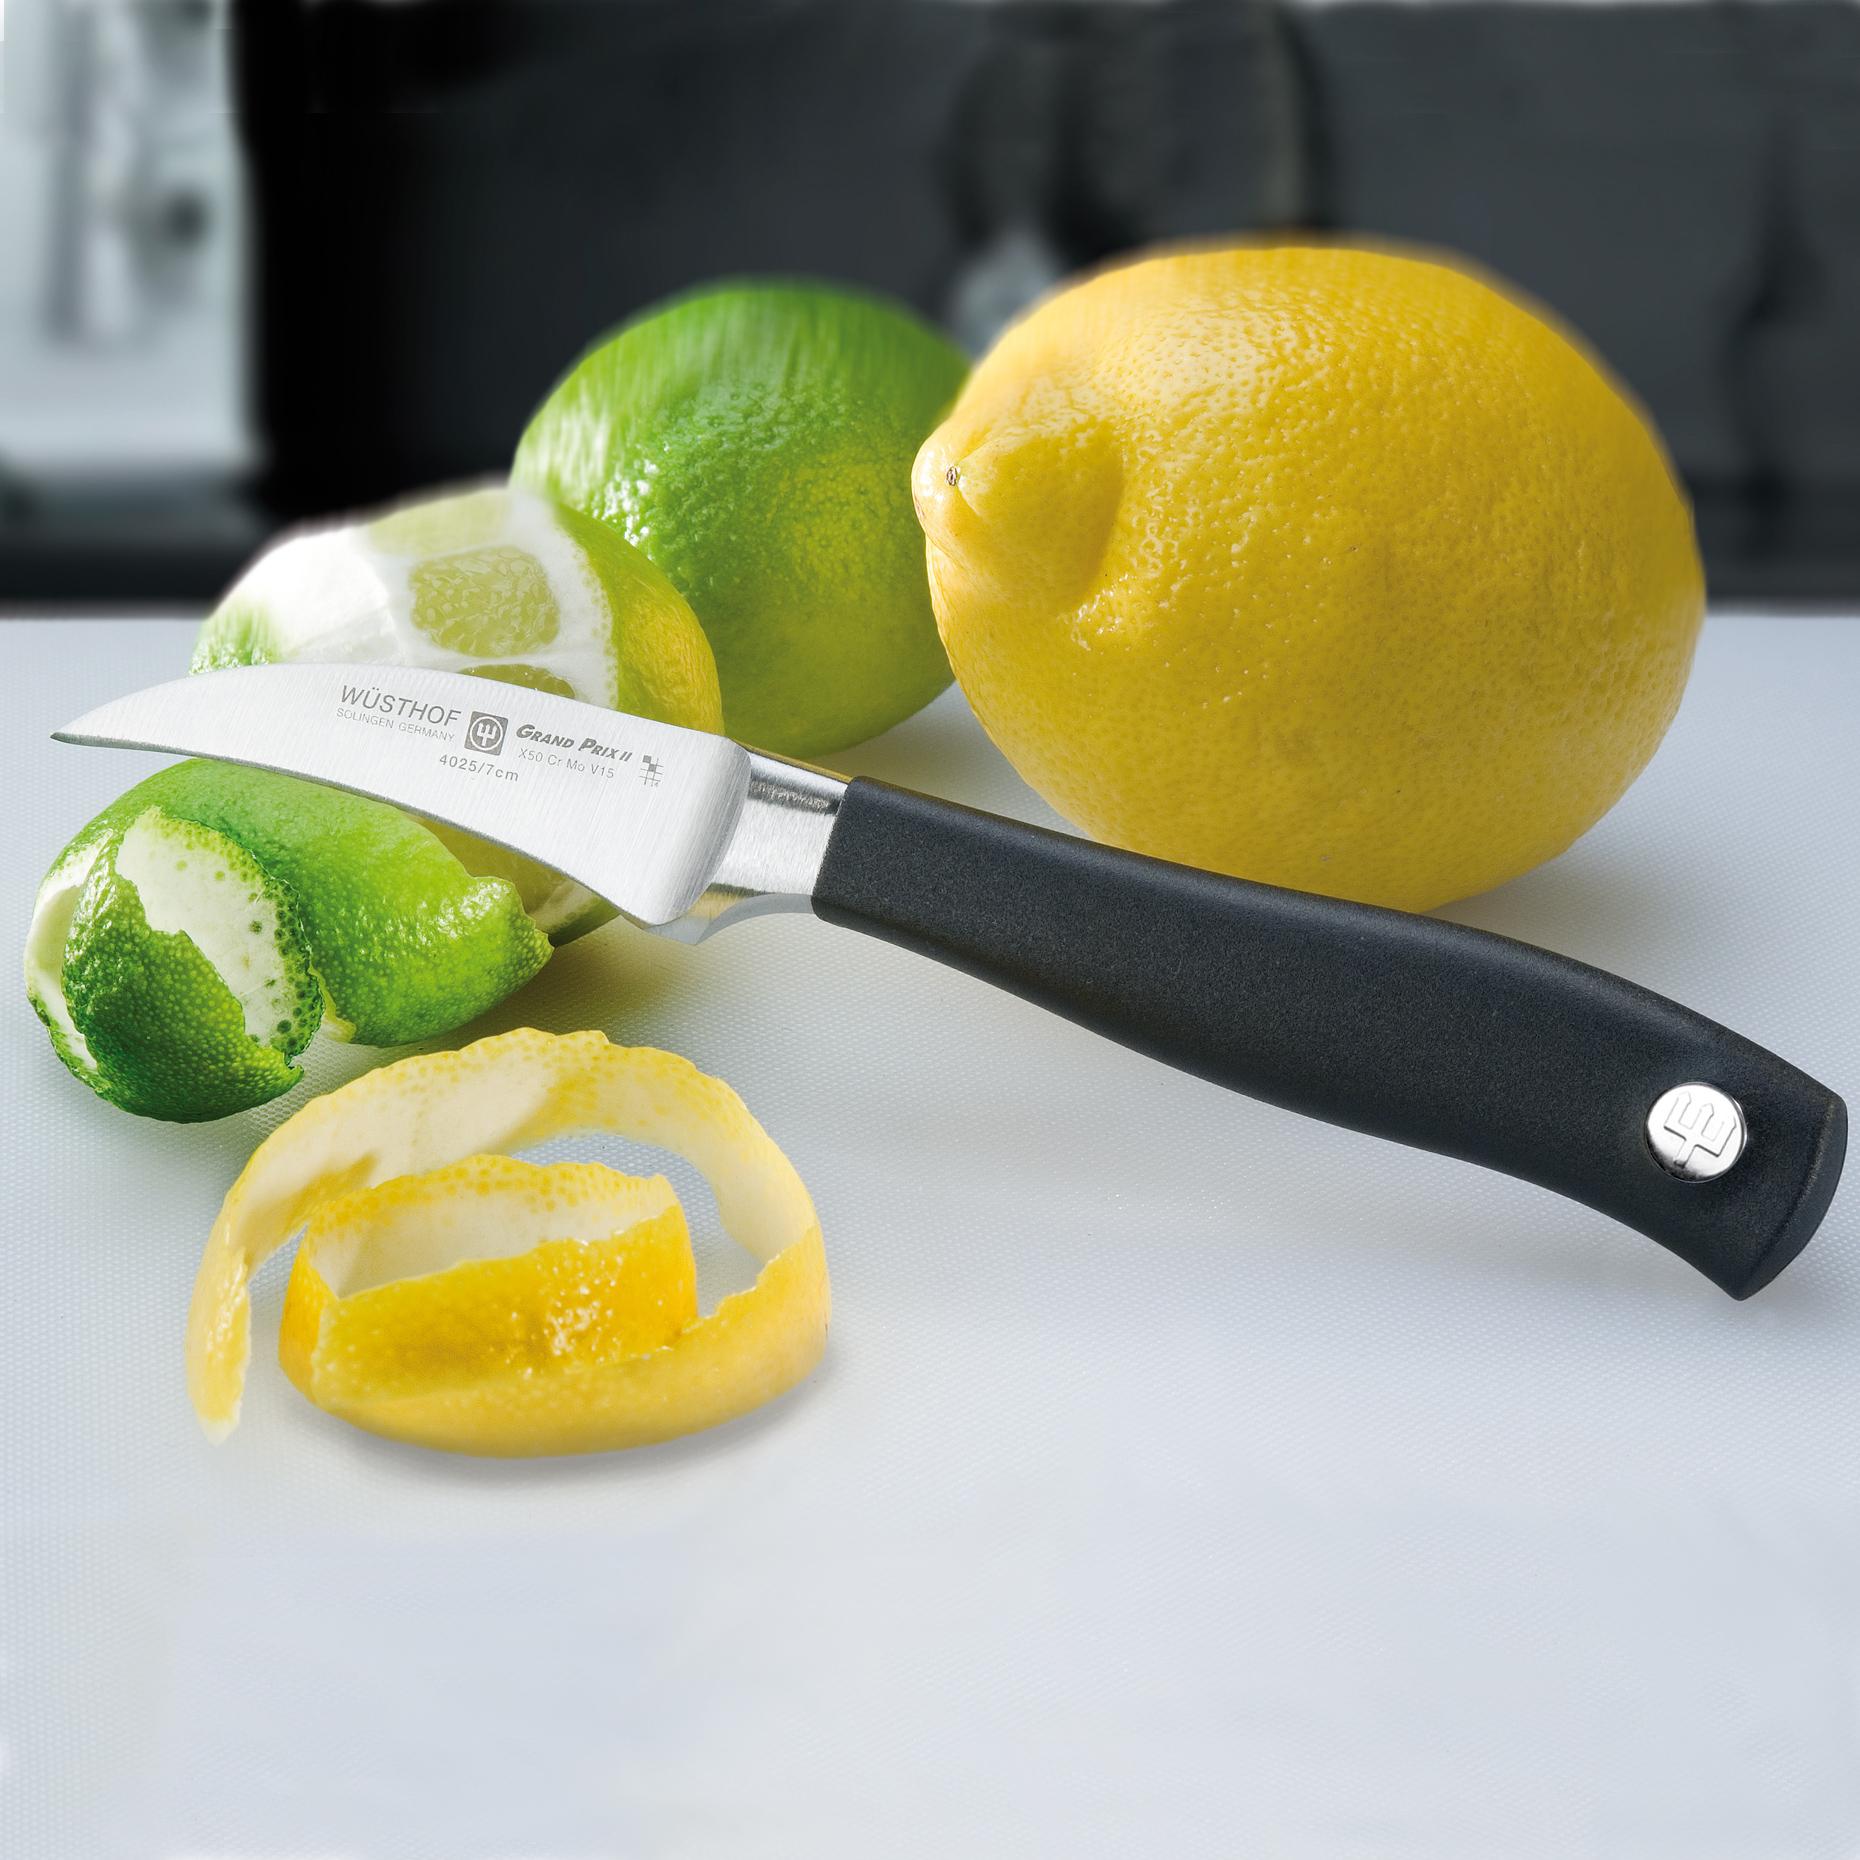 Wusthof Grand Prix II Peeling Knife, 2.75 Inch